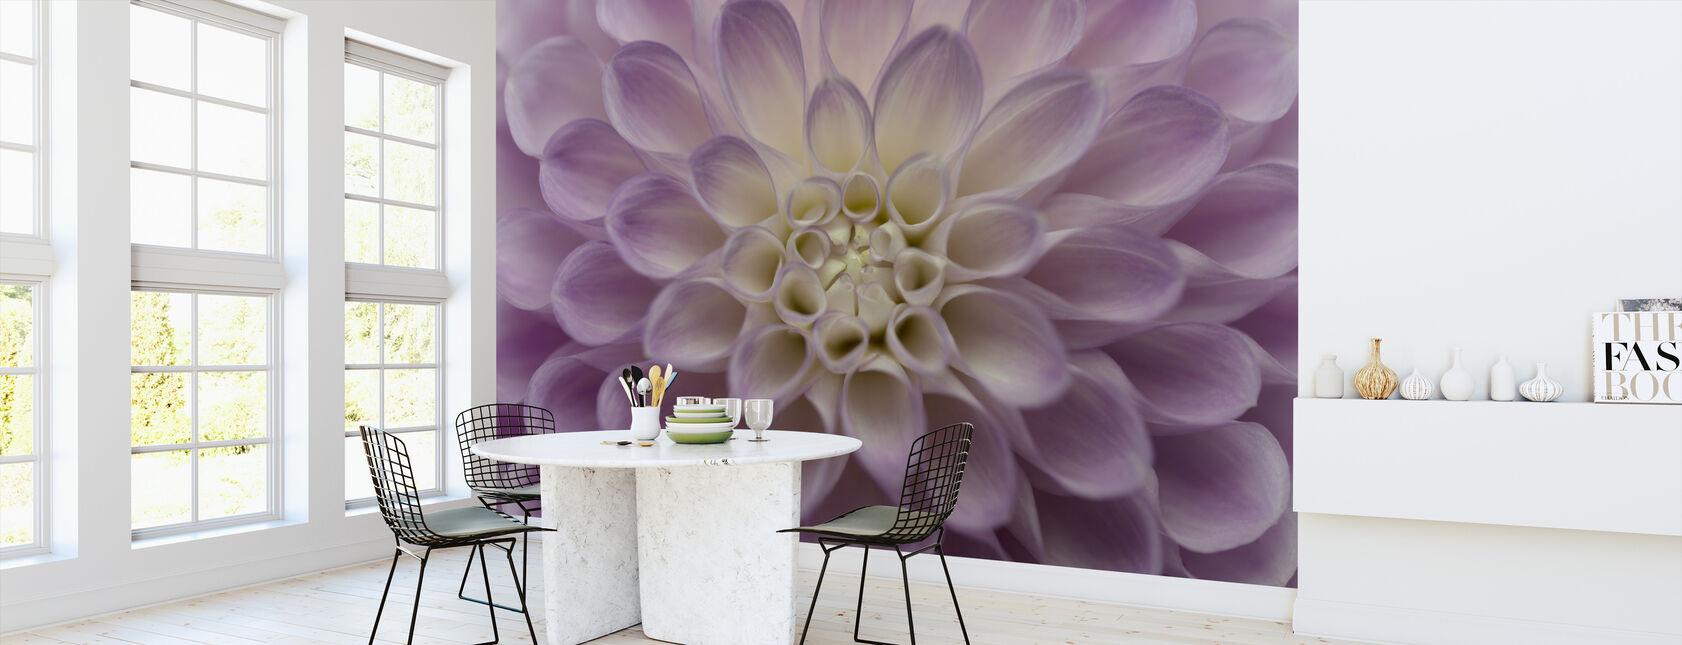 Dahlia - Wallpaper - Kitchen